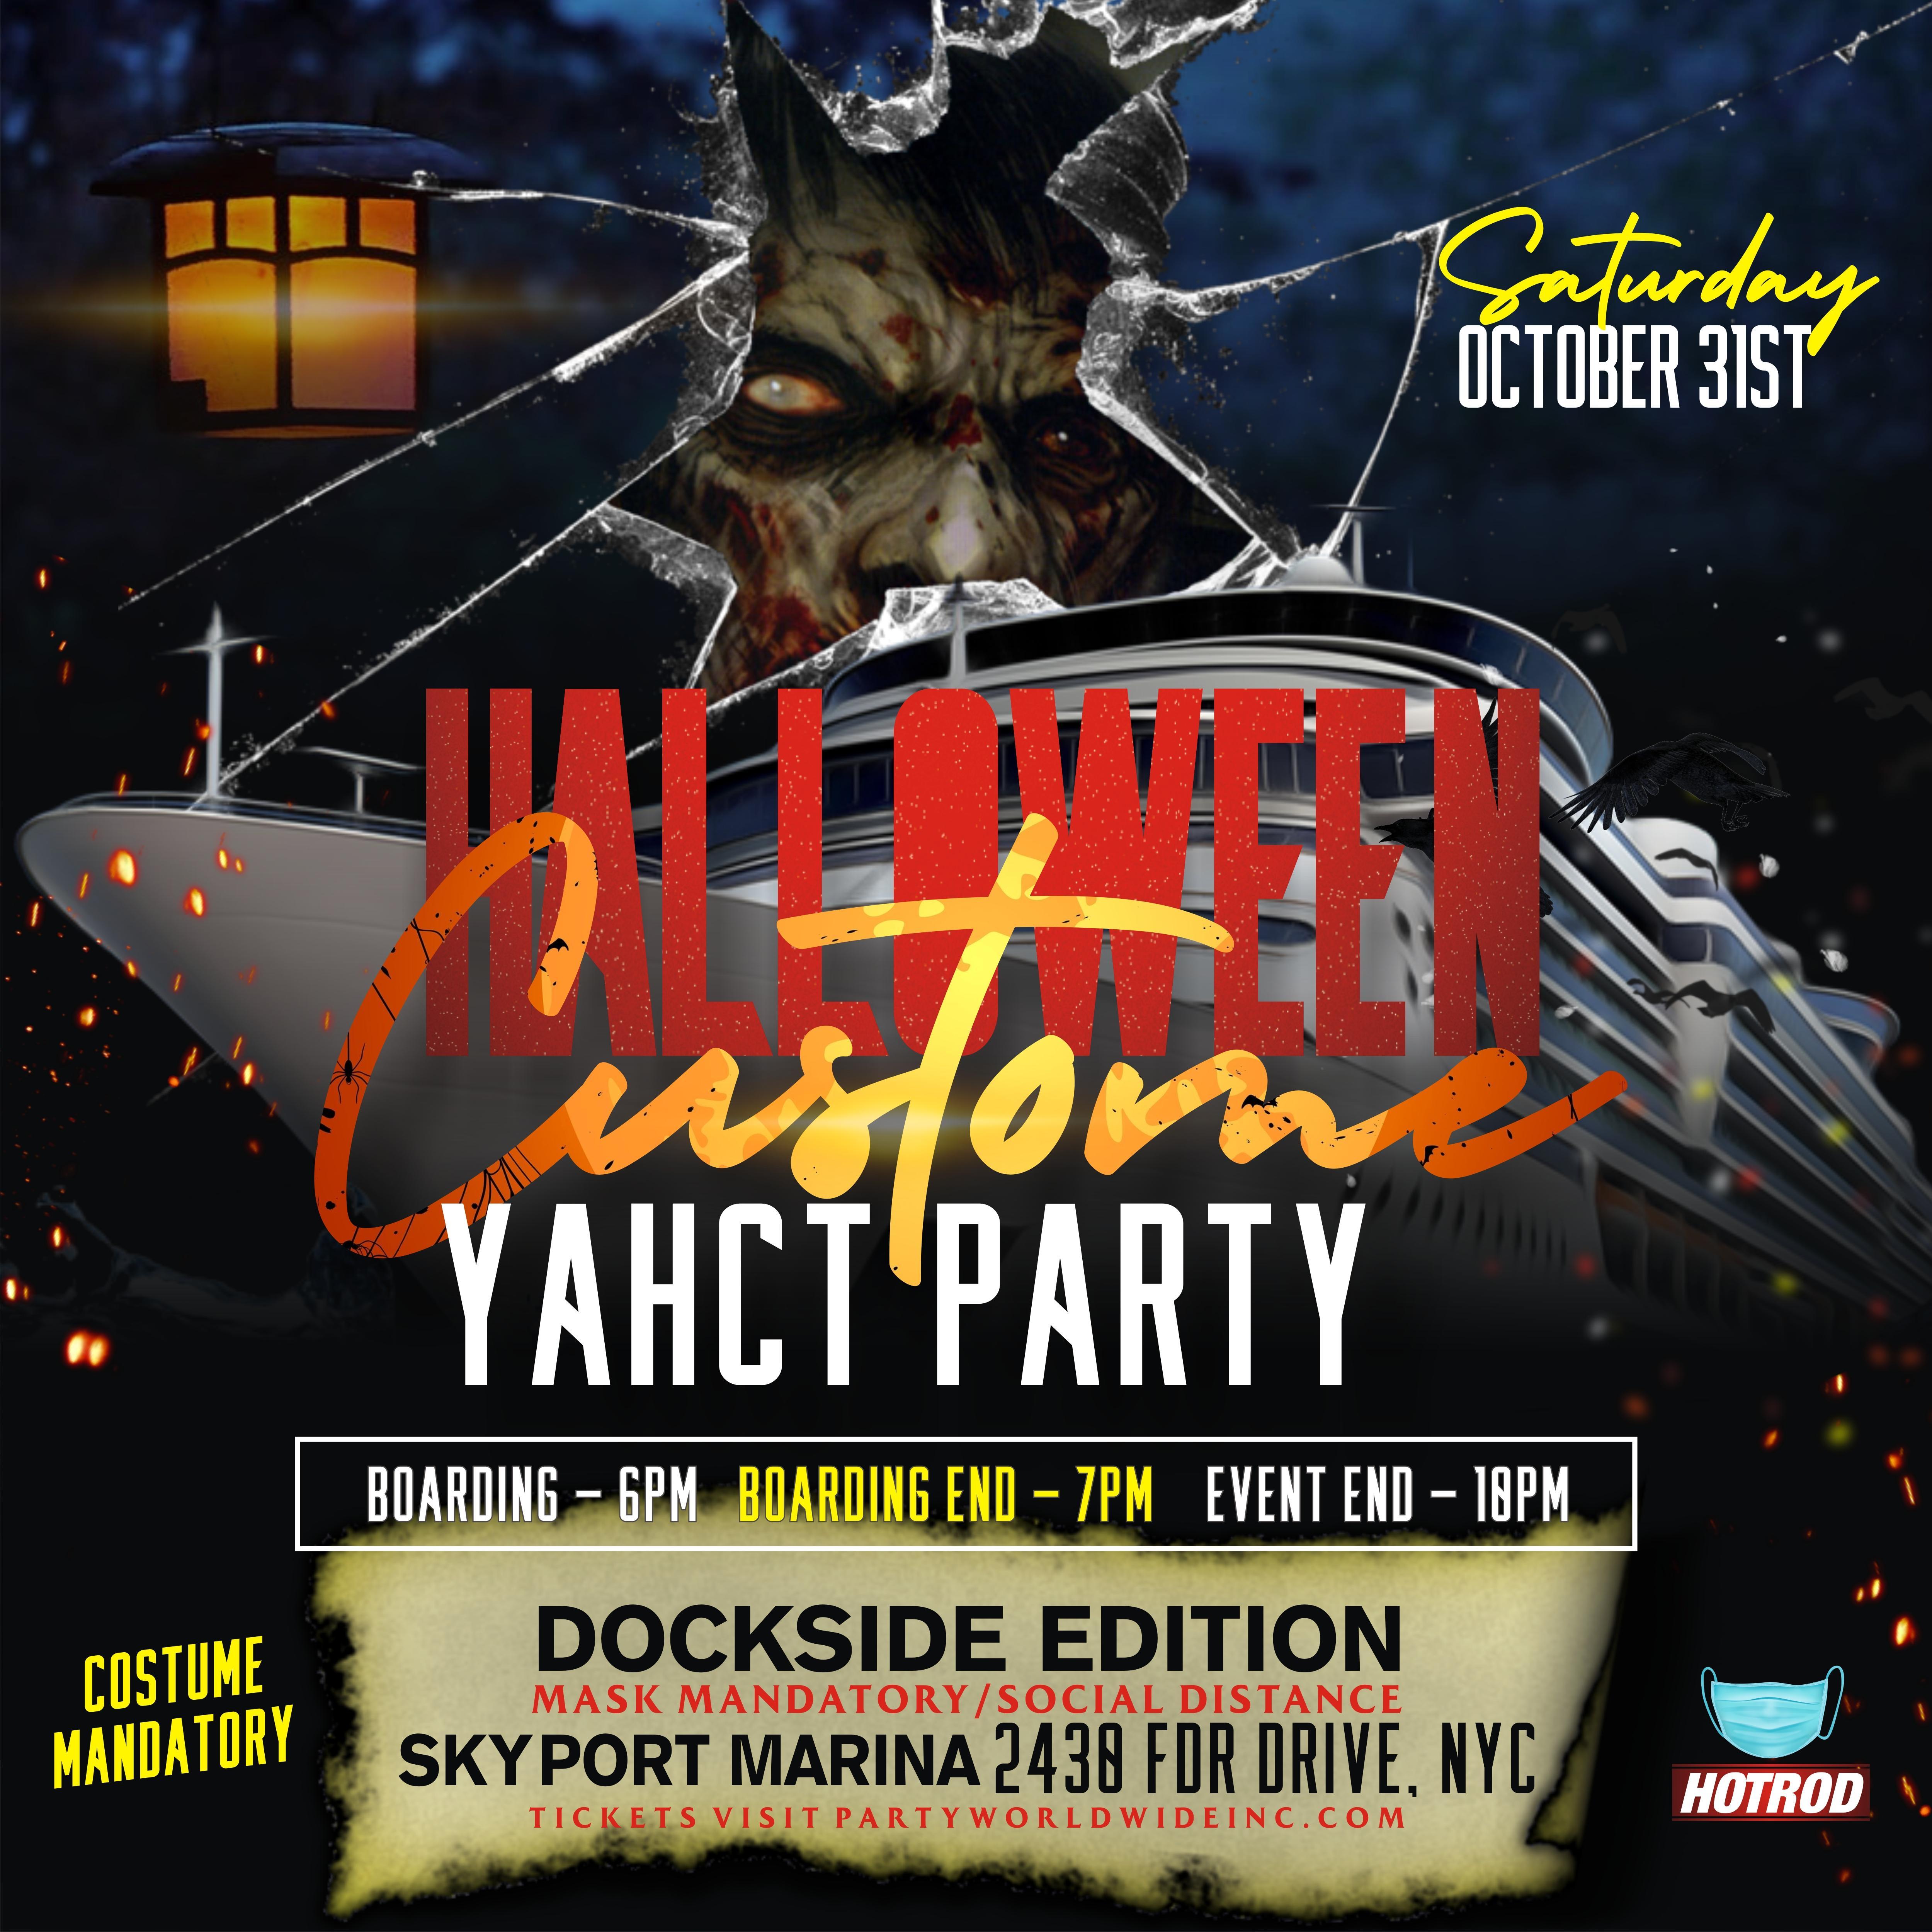 Halloween Events 2020 Nyc 31s HALLOWEEN NIGHT COSTUME YACHT Event Dockside NEW YORK CITY   31